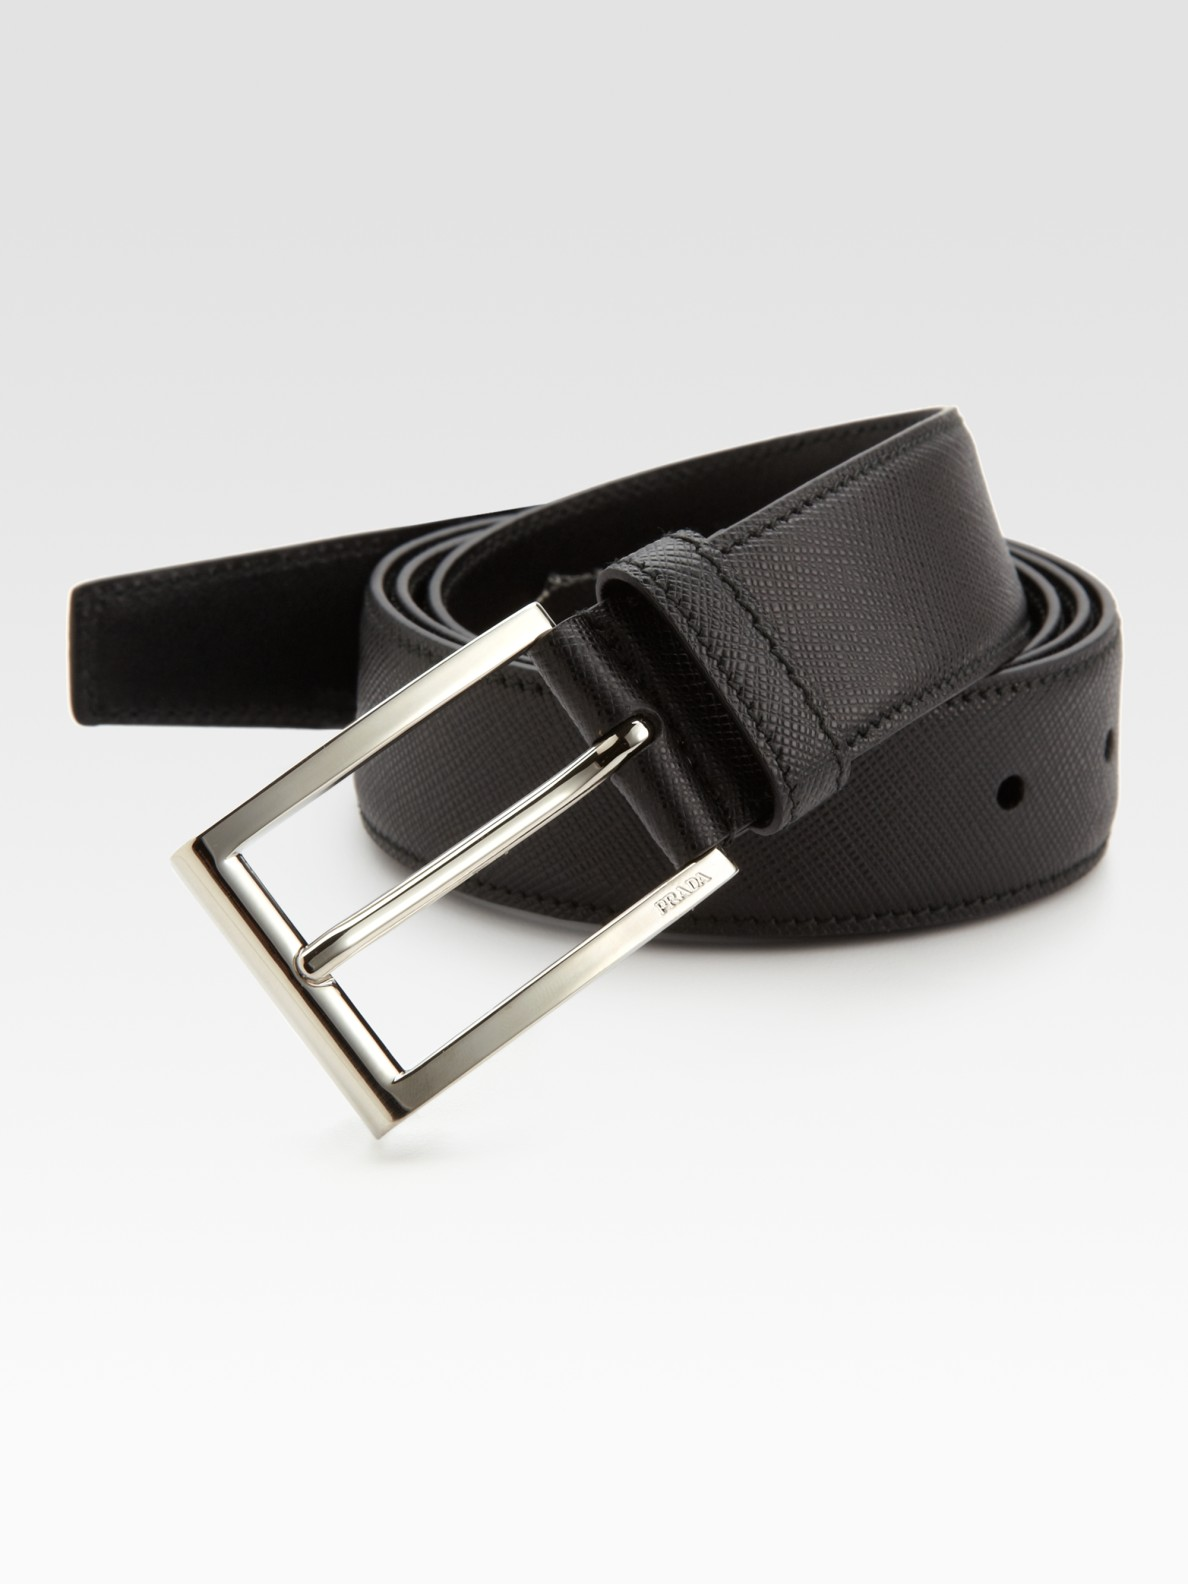 Prada Saffiano Dress Belt In Black For Men